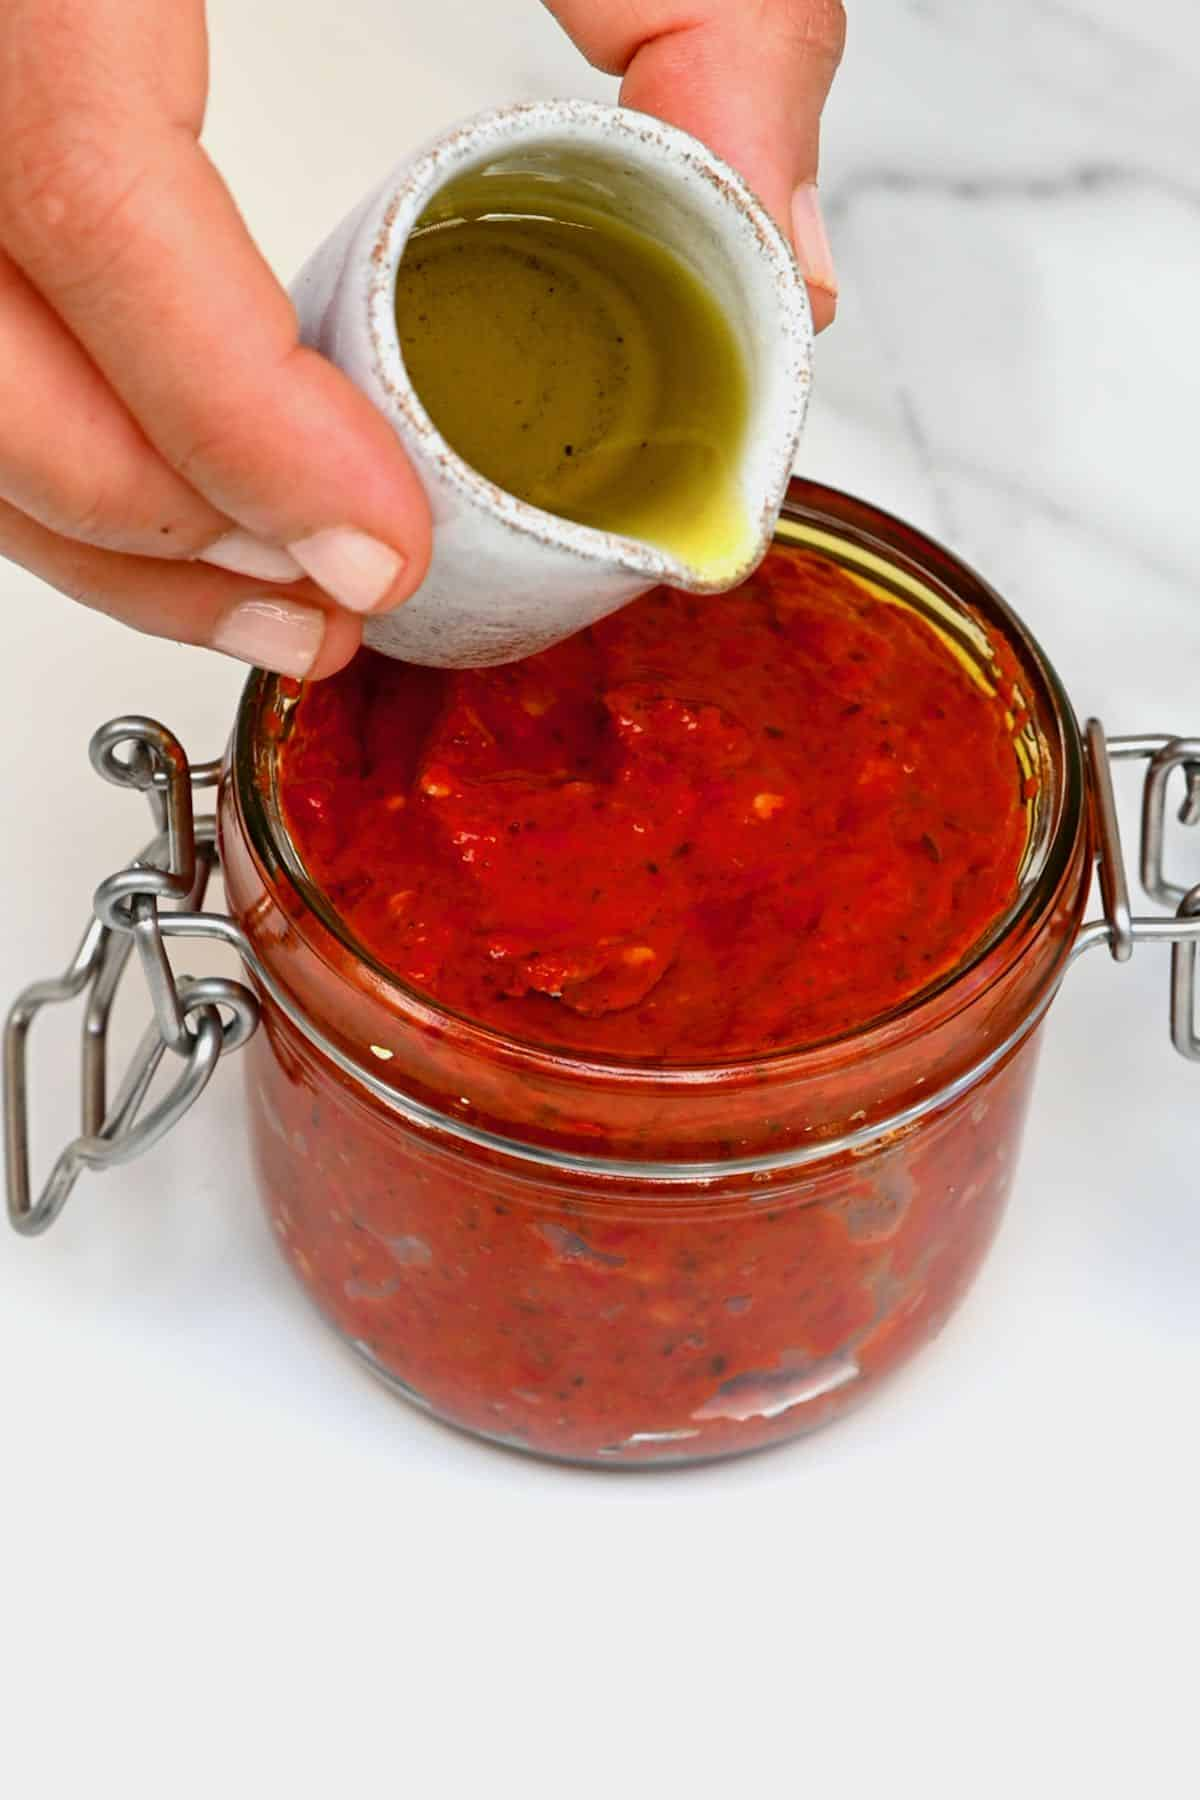 Adding oil to harissa in a jar